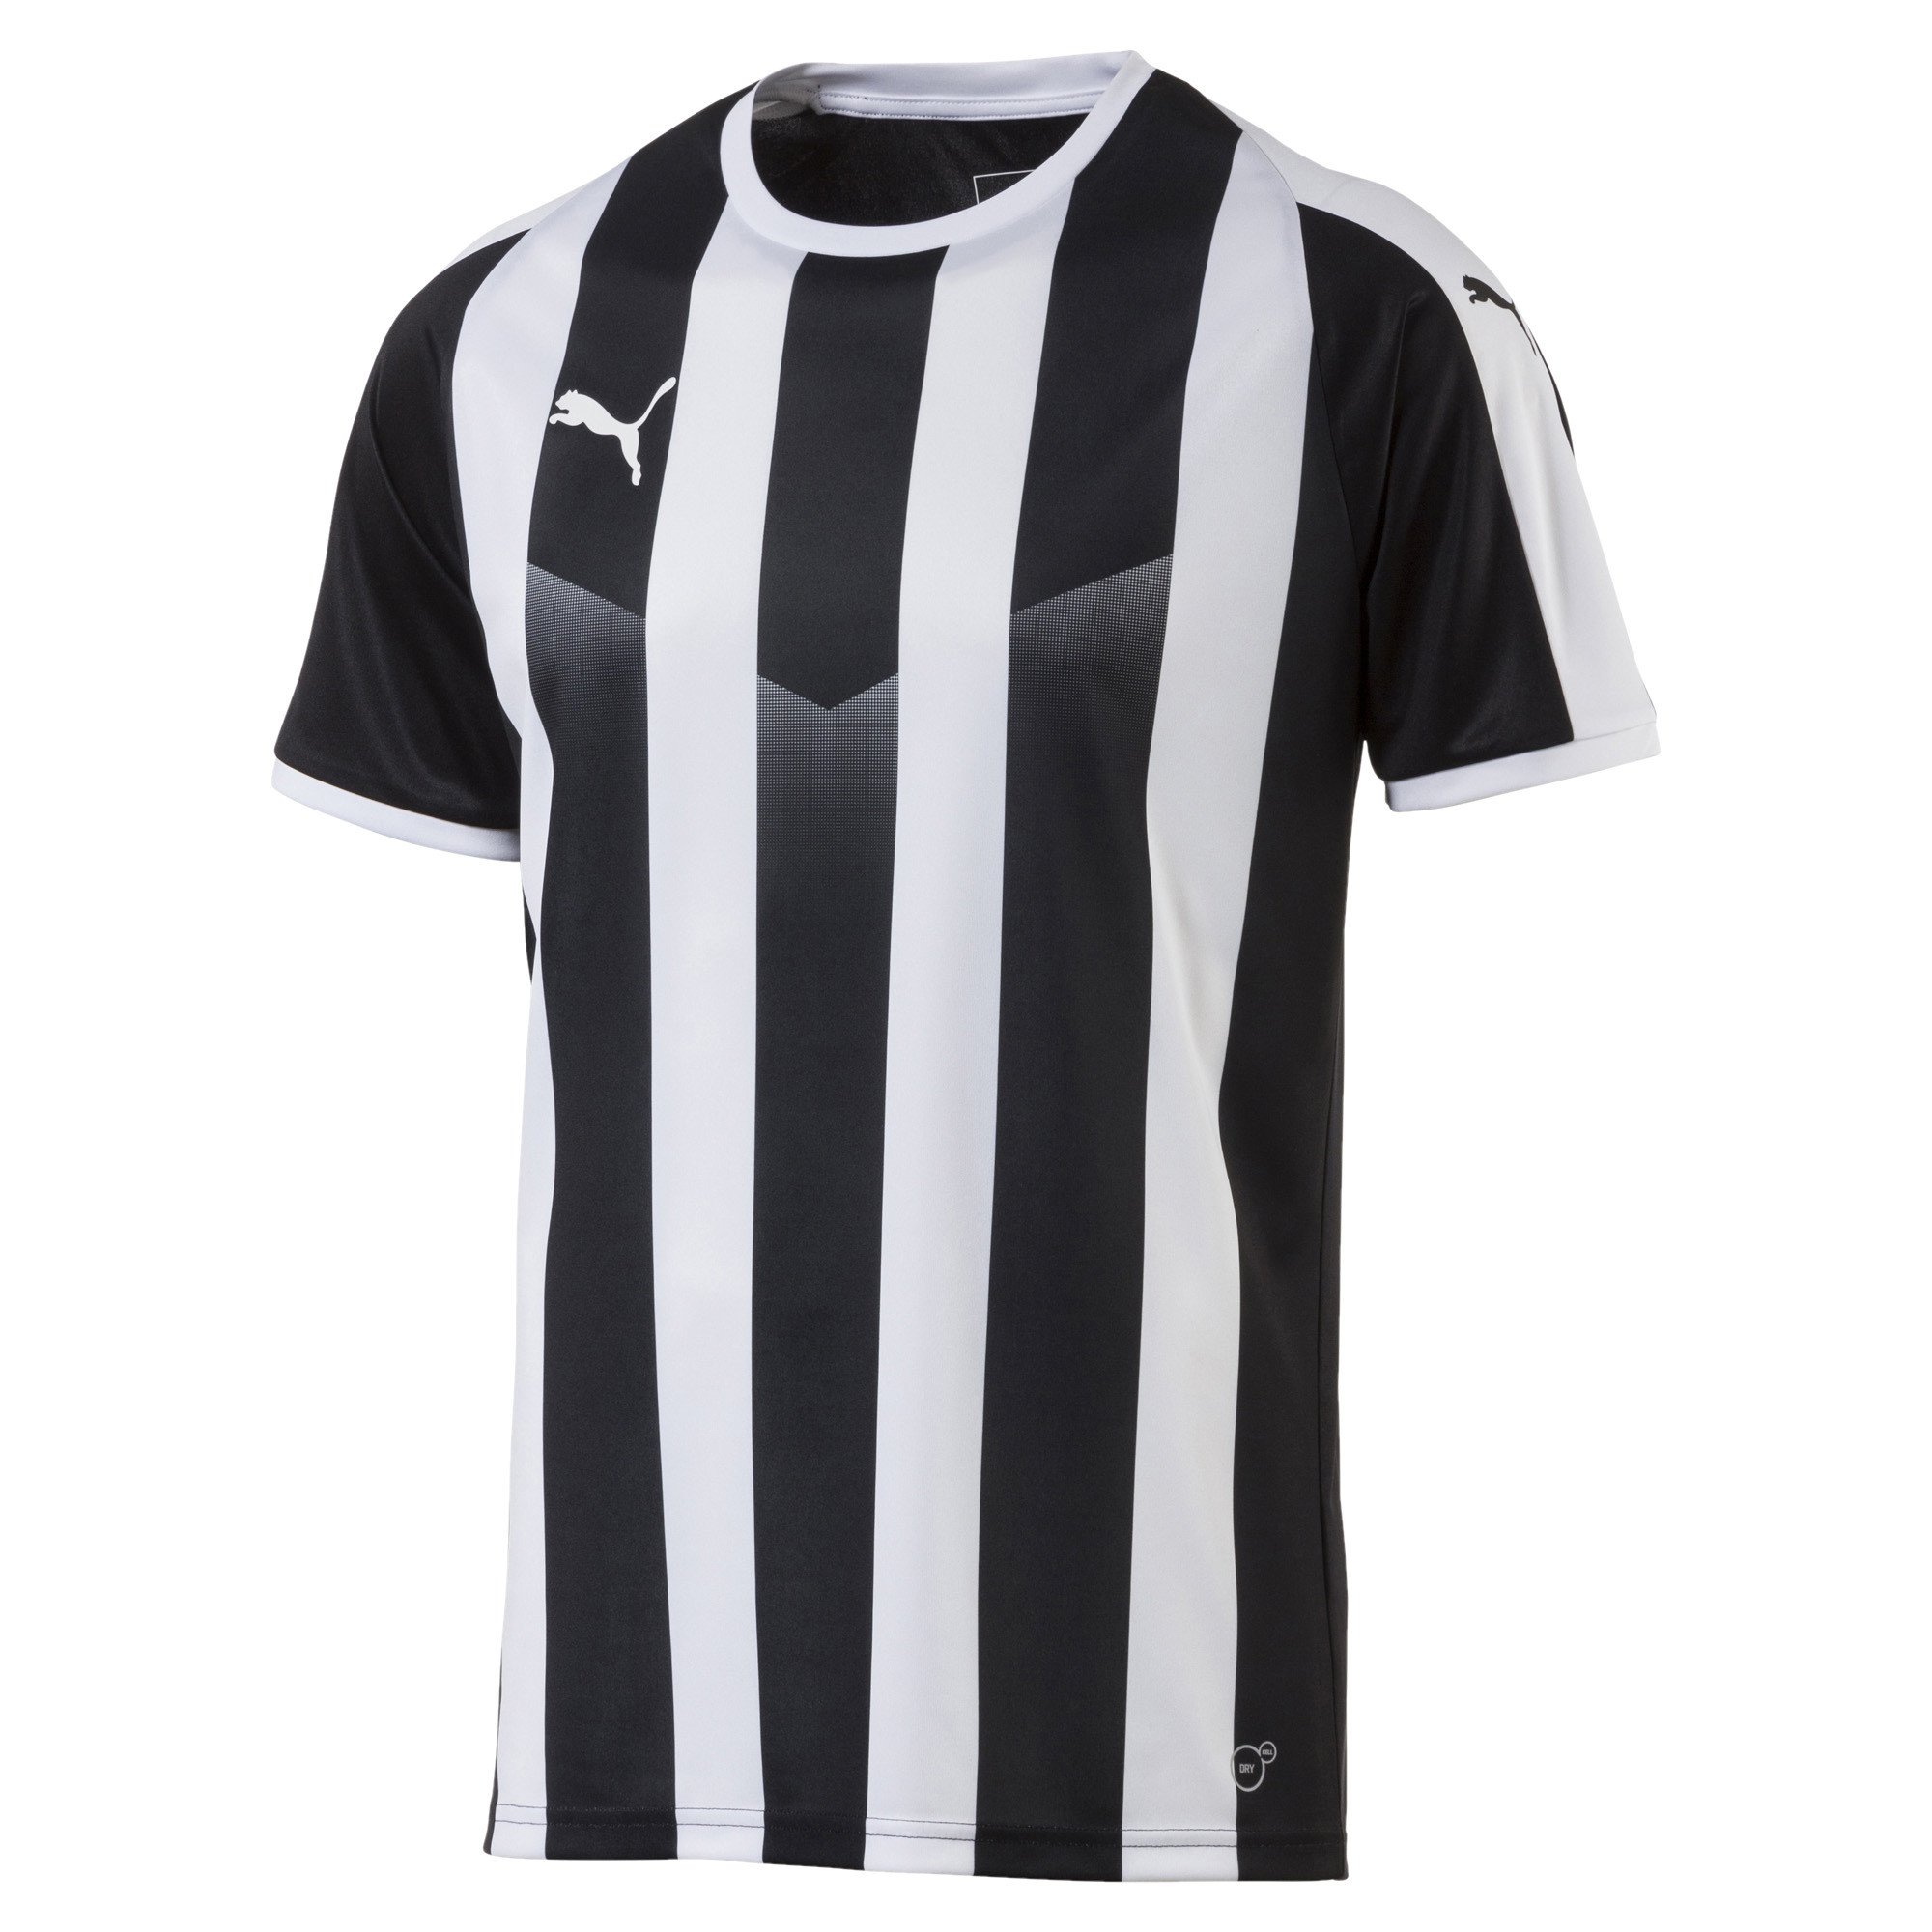 Camiseta de fútbol rayada para hombre Liga